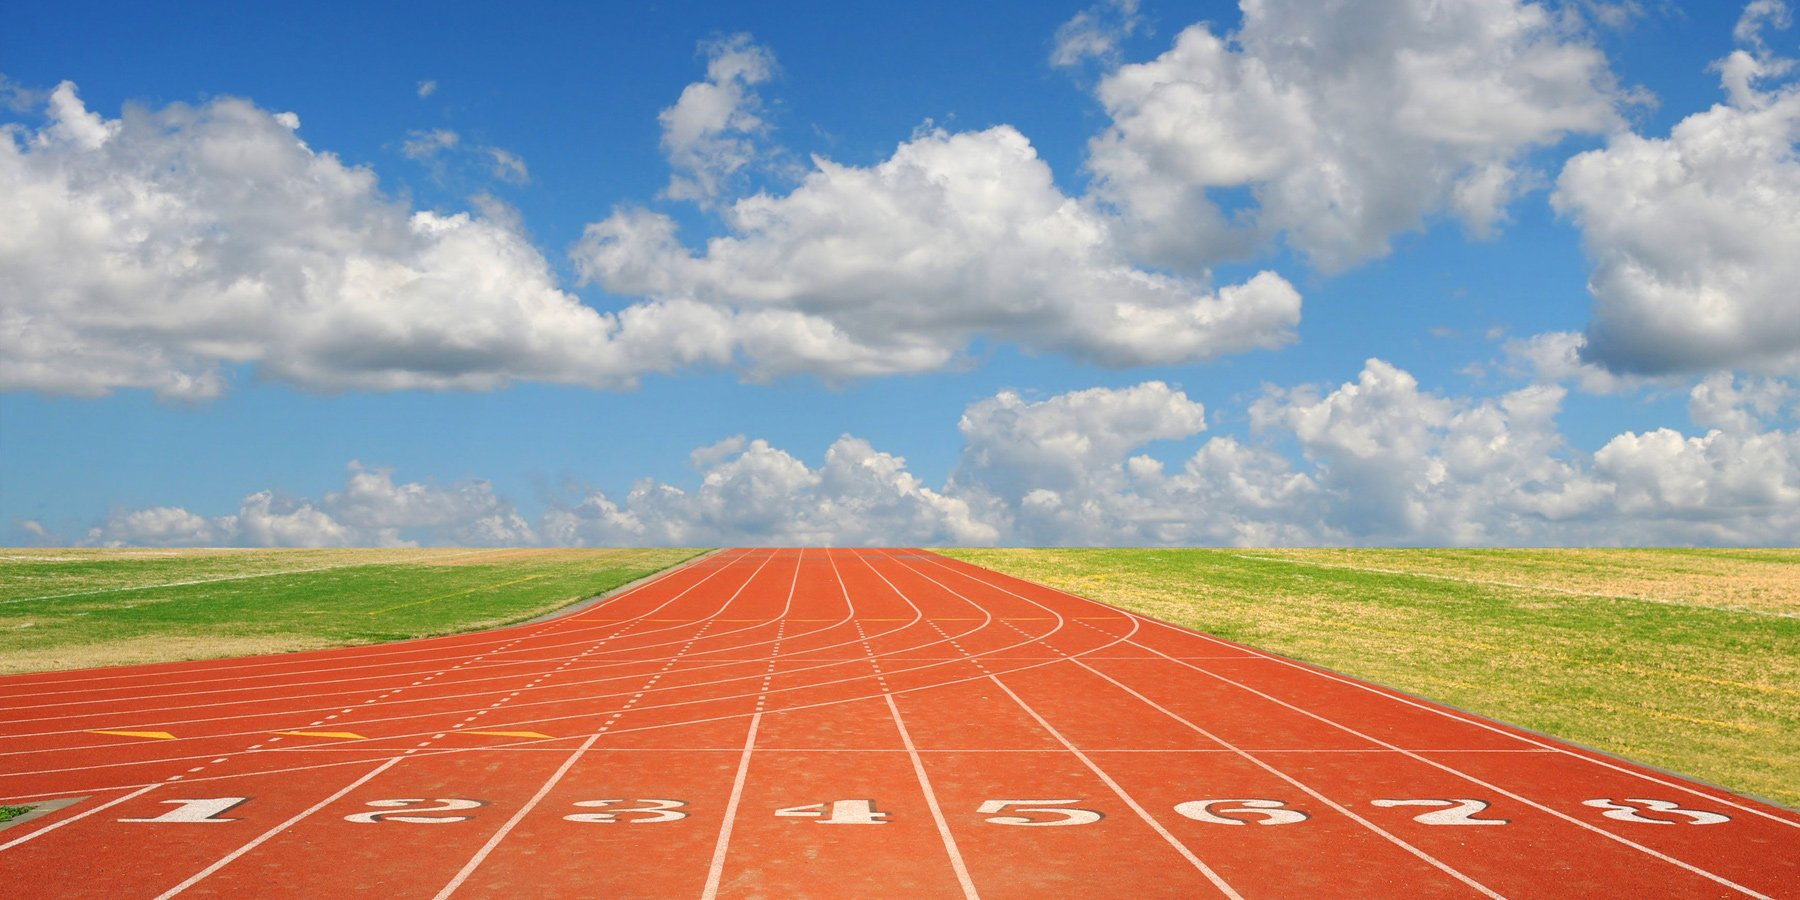 Race Track Wallpaper